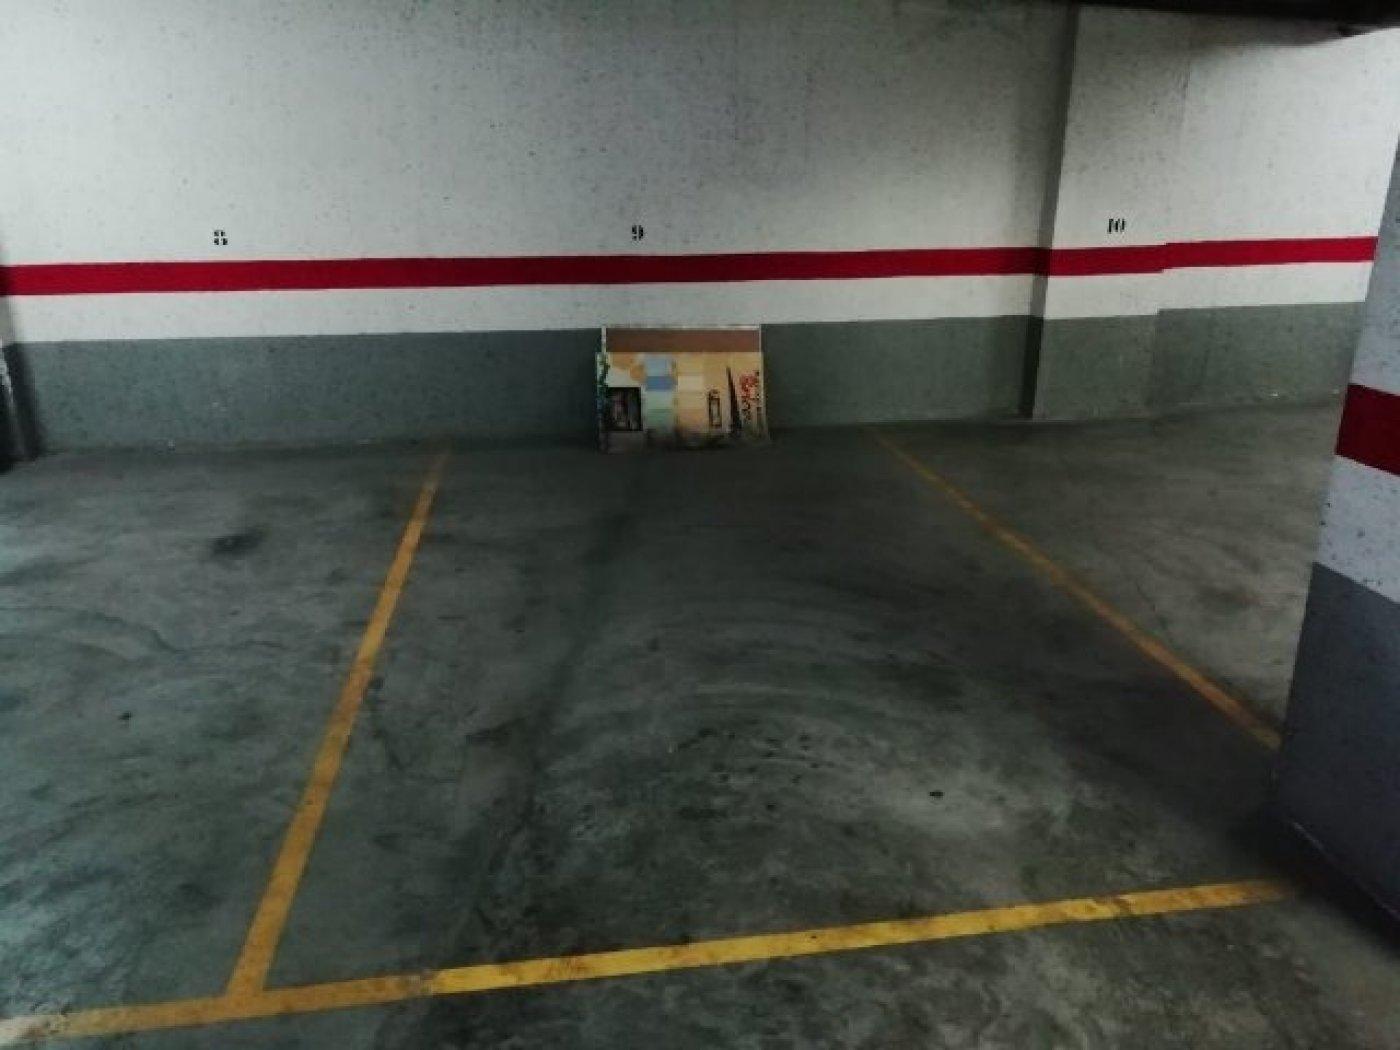 Lloguer Aparcament cotxe  Aldaia ,plaza europa. Se alquila plaza de garaje en Aldaia